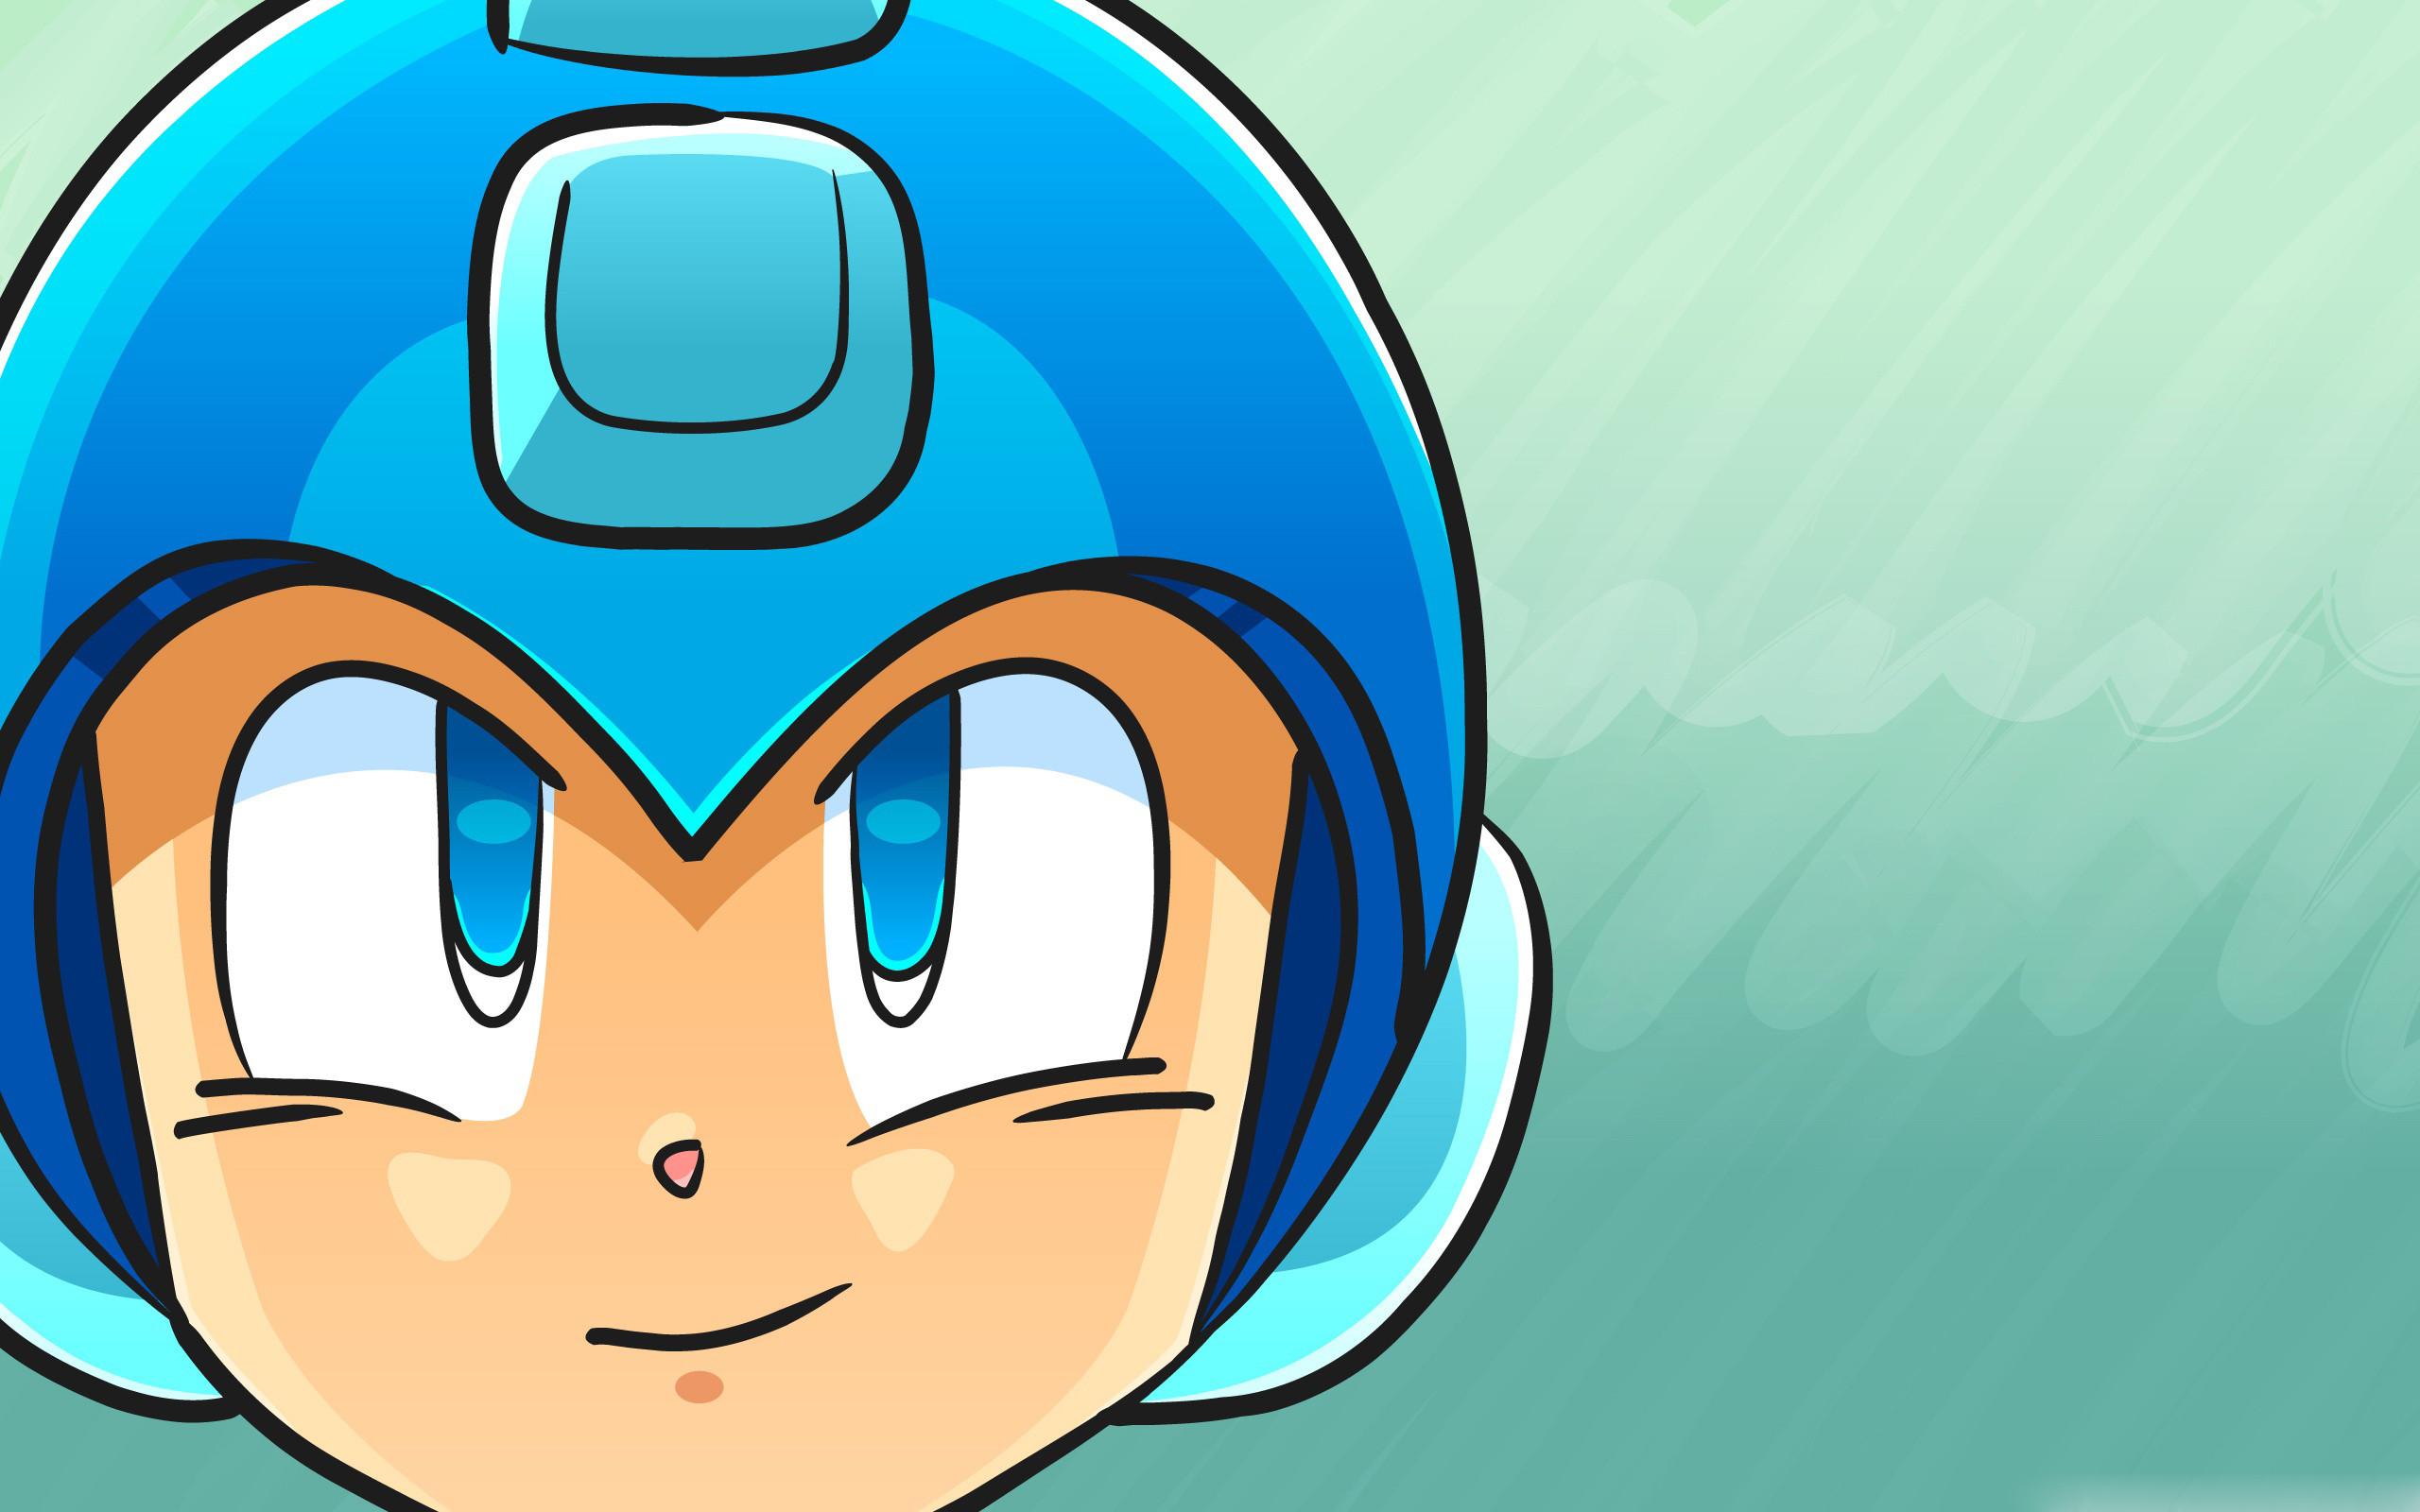 Free-Desktop-Megaman-Backgrounds